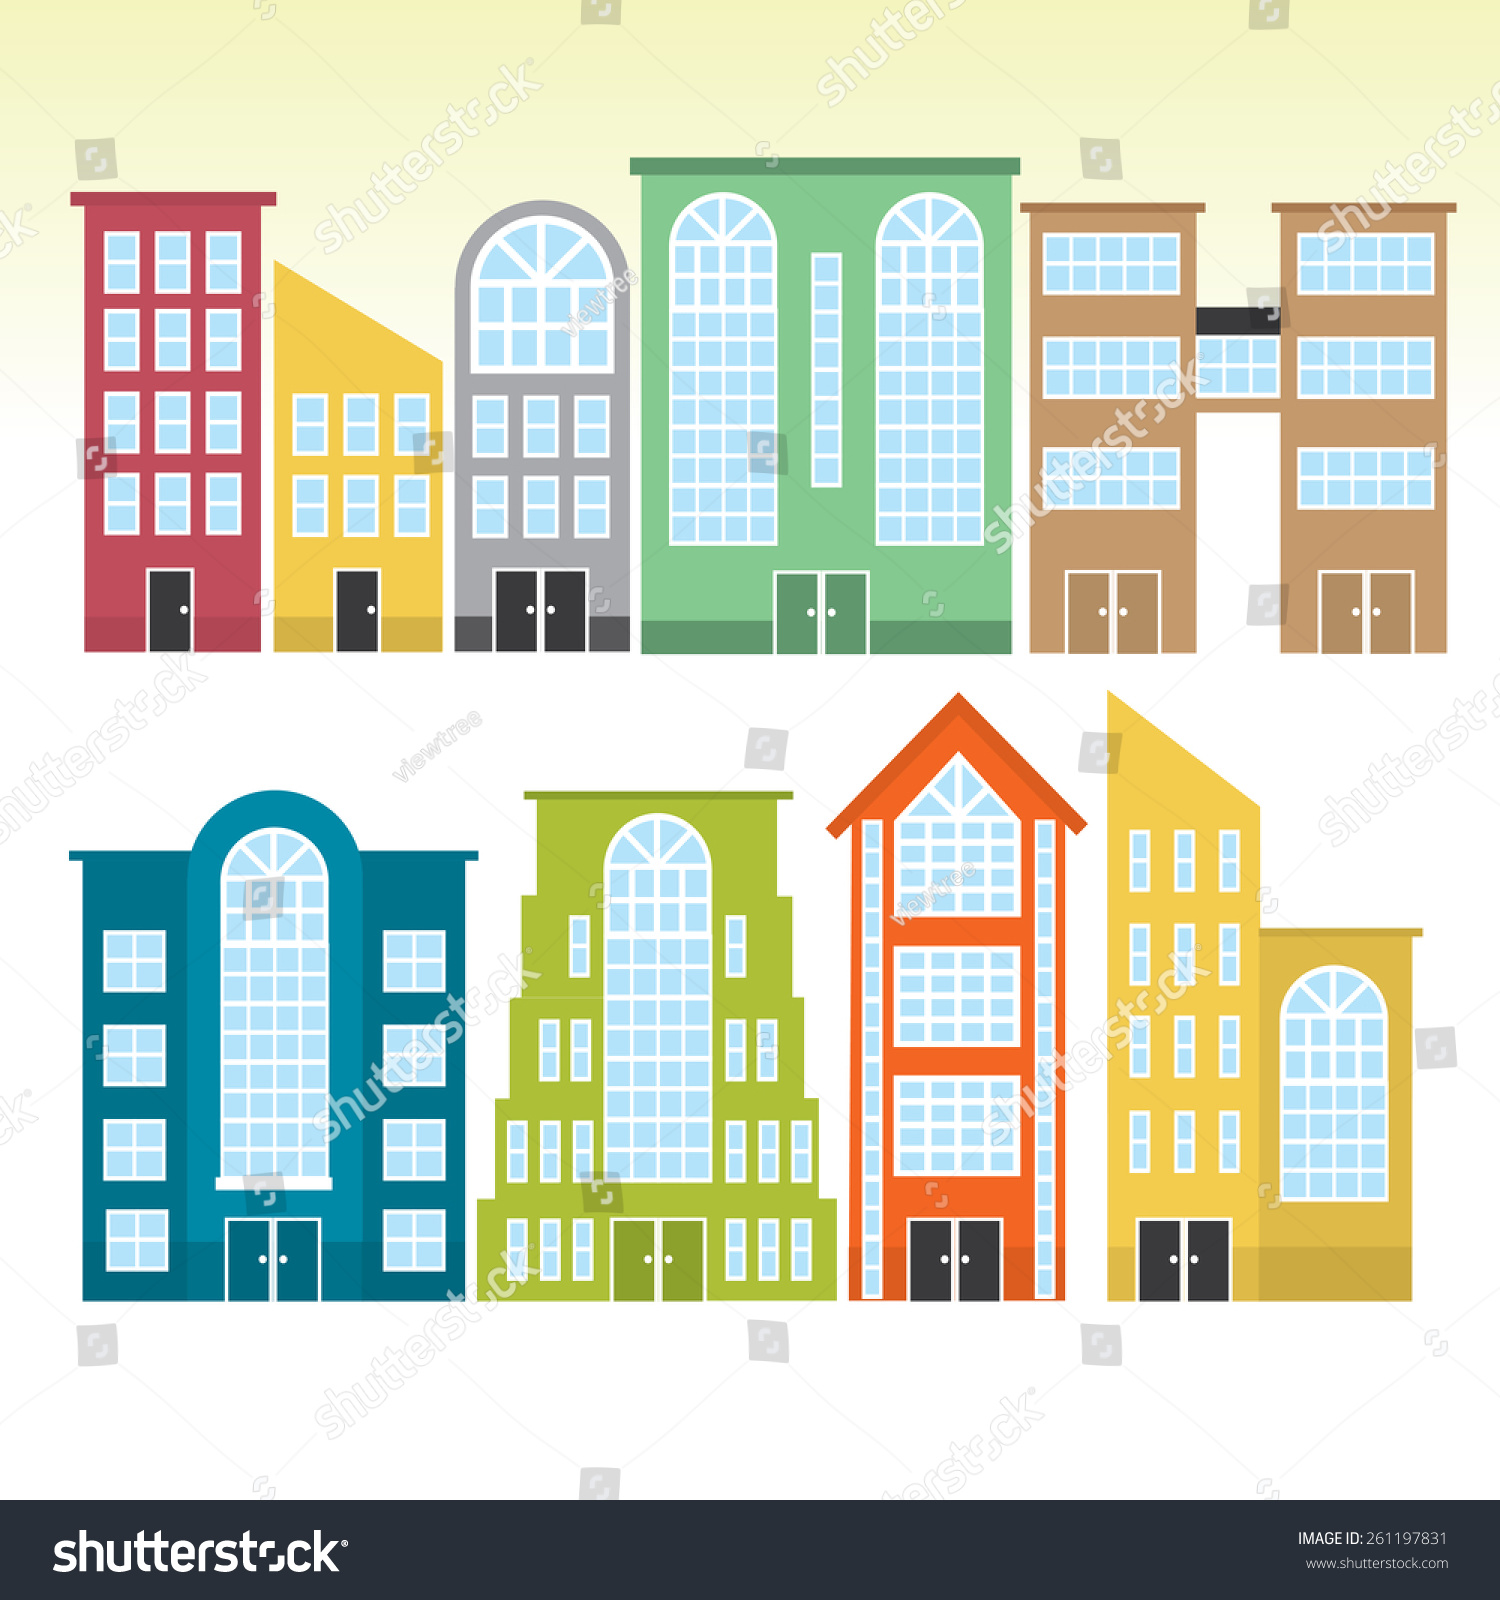 Building symbol icon design vector illustration stock vector building symbol icon design vector illustration biocorpaavc